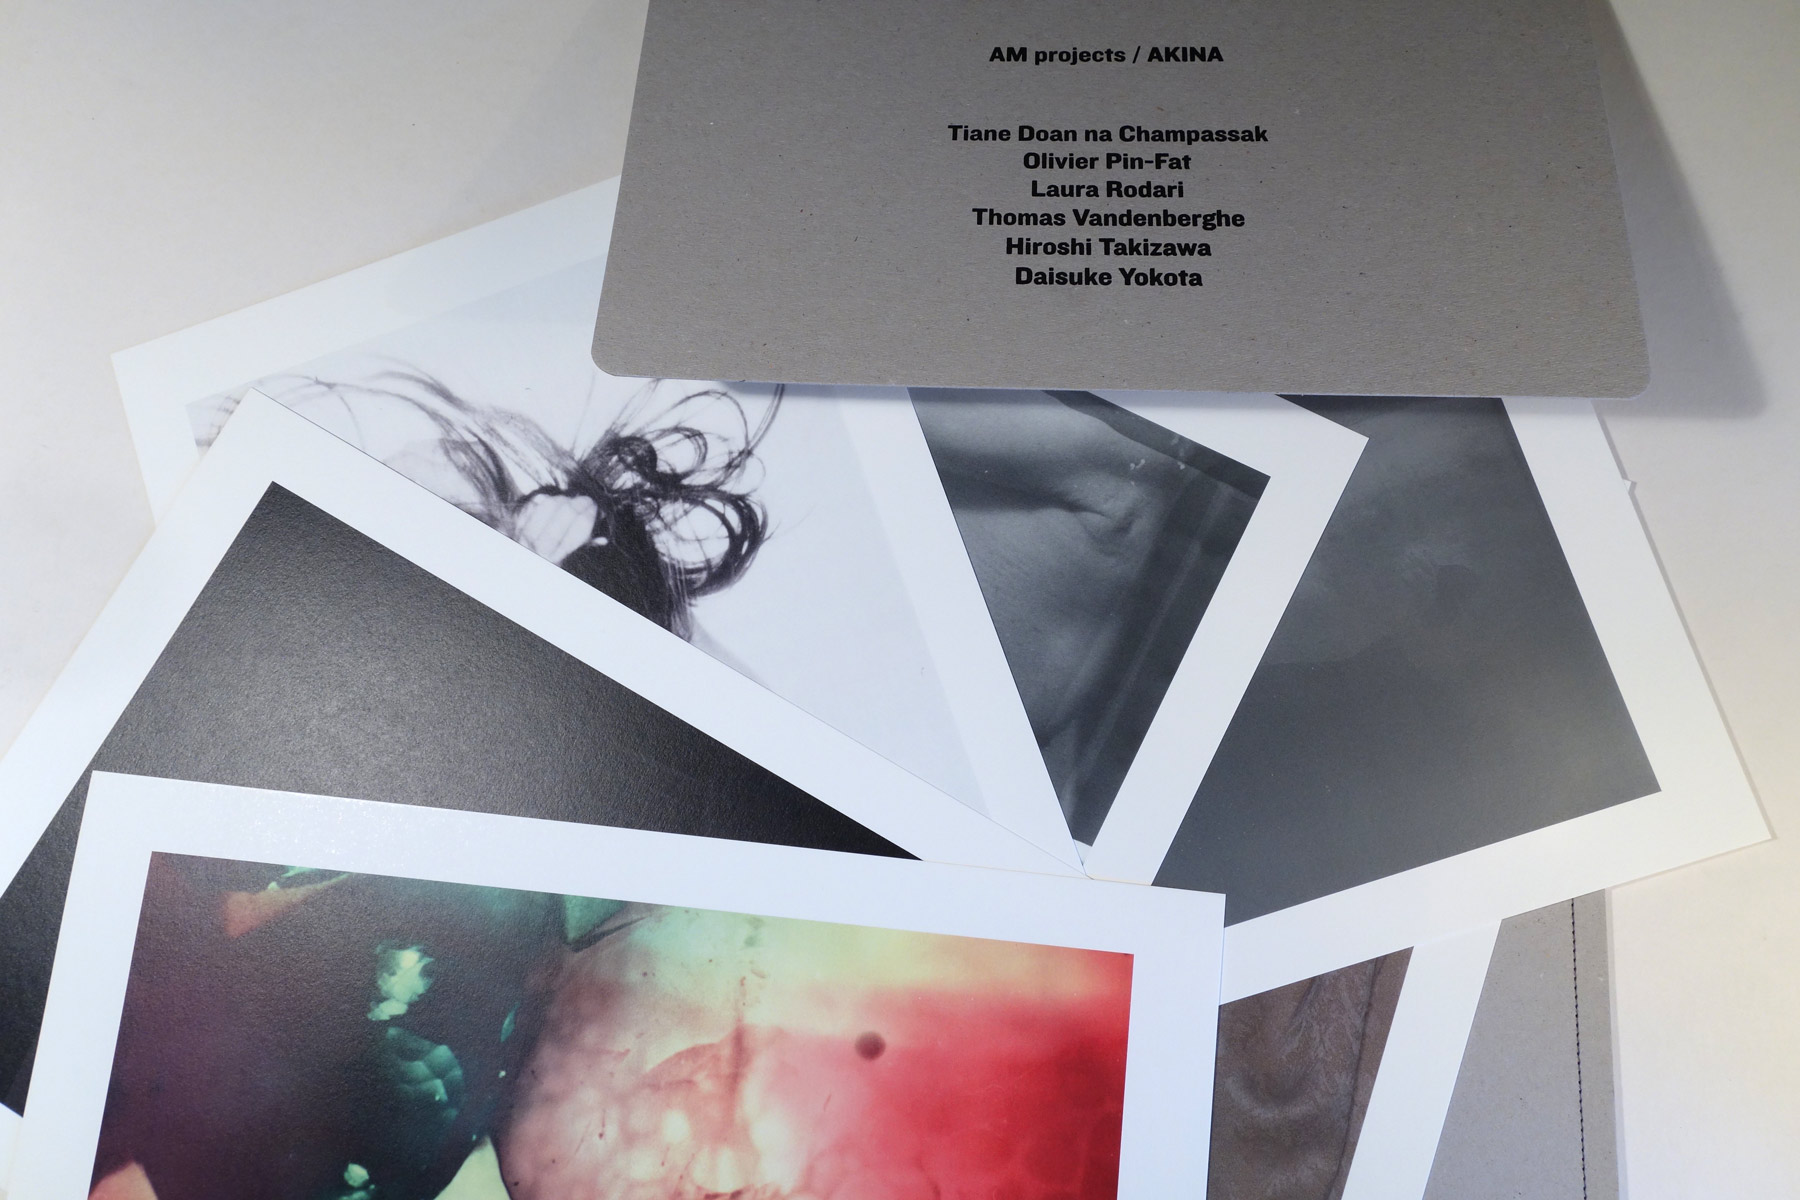 BKK Bangkok AMprojects Akina prints Champassak Vandenberghe Rodari Yokota  Takizawa Pin-Fat ...